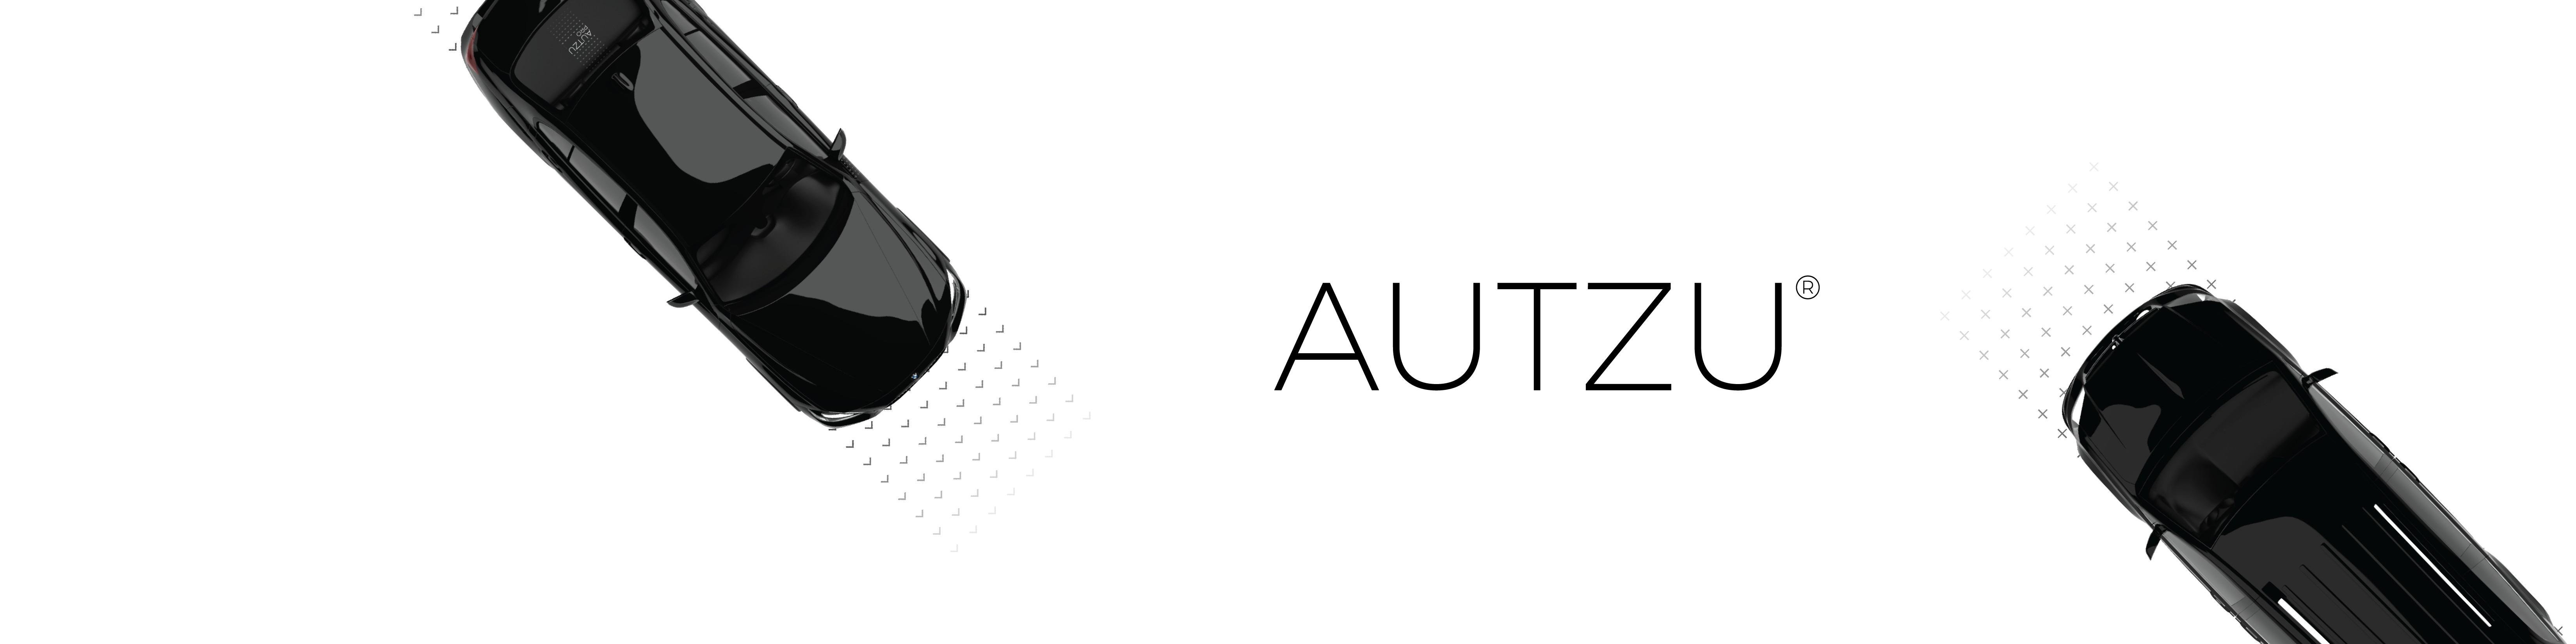 Autzu | LinkedIn